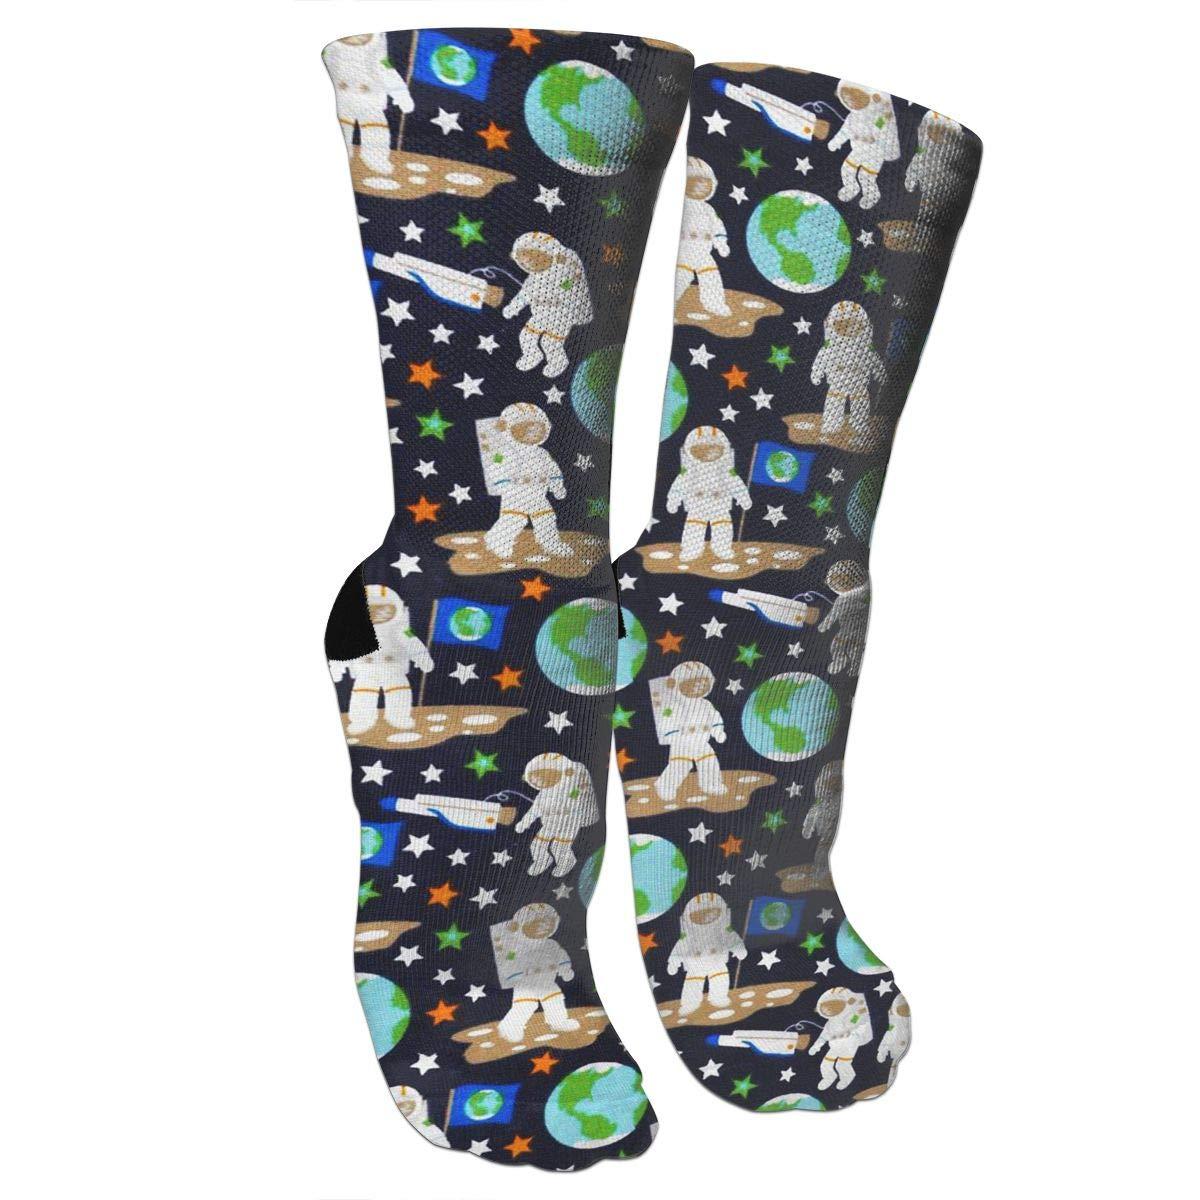 Astronaut Art Casual Socks Crew Socks Crazy Socks Soft Breathable For Sports Athletic Running